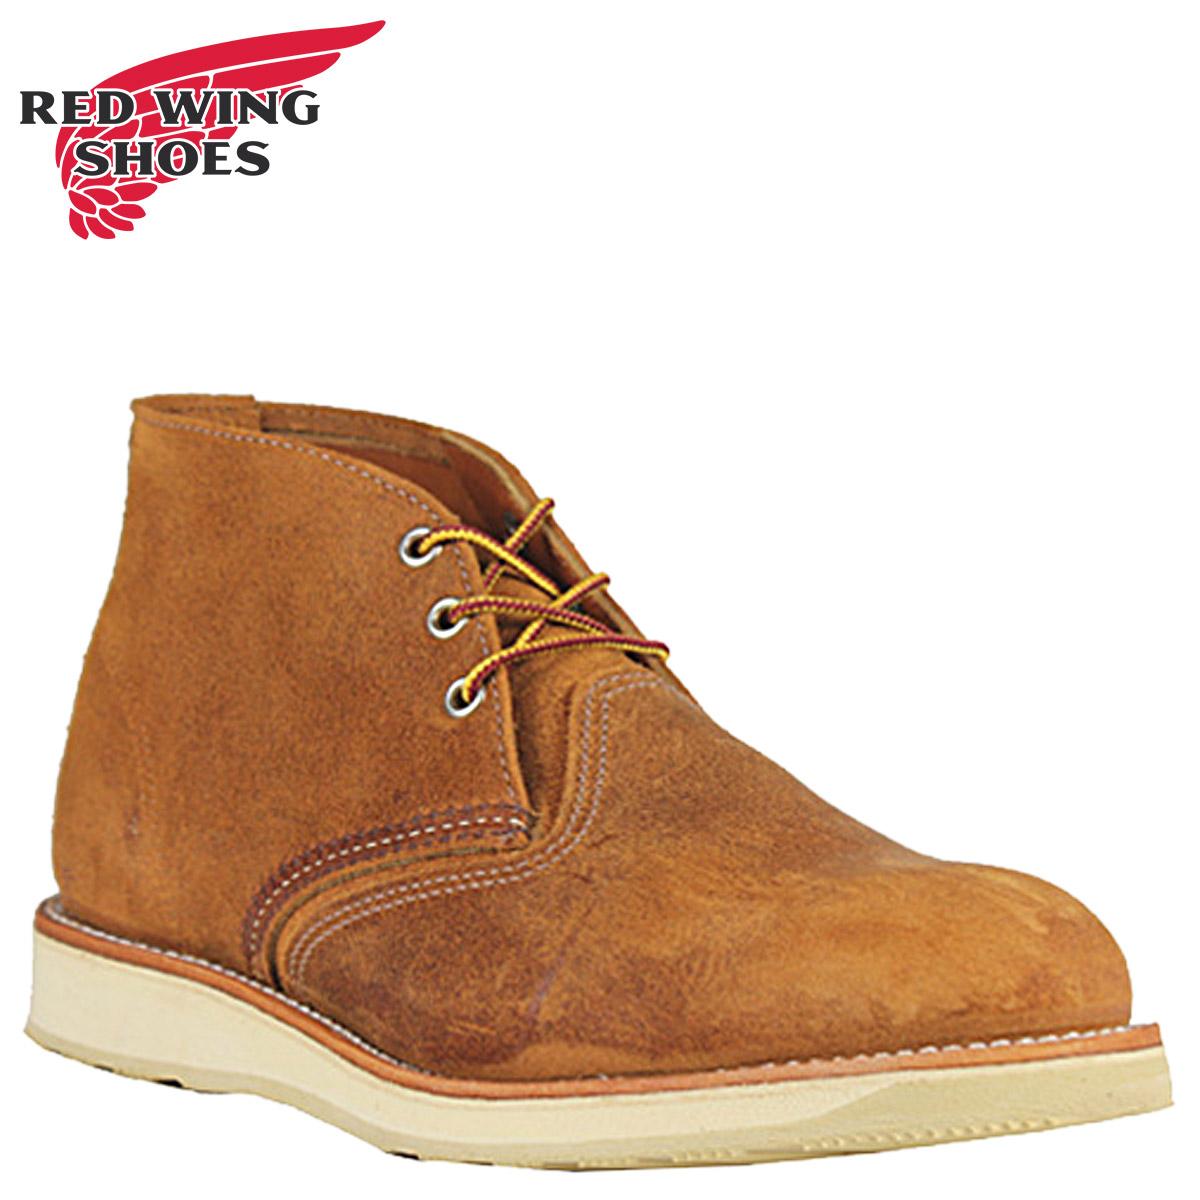 Sugar Online Shop | Rakuten Global Market: Redwing RED WING boots ...